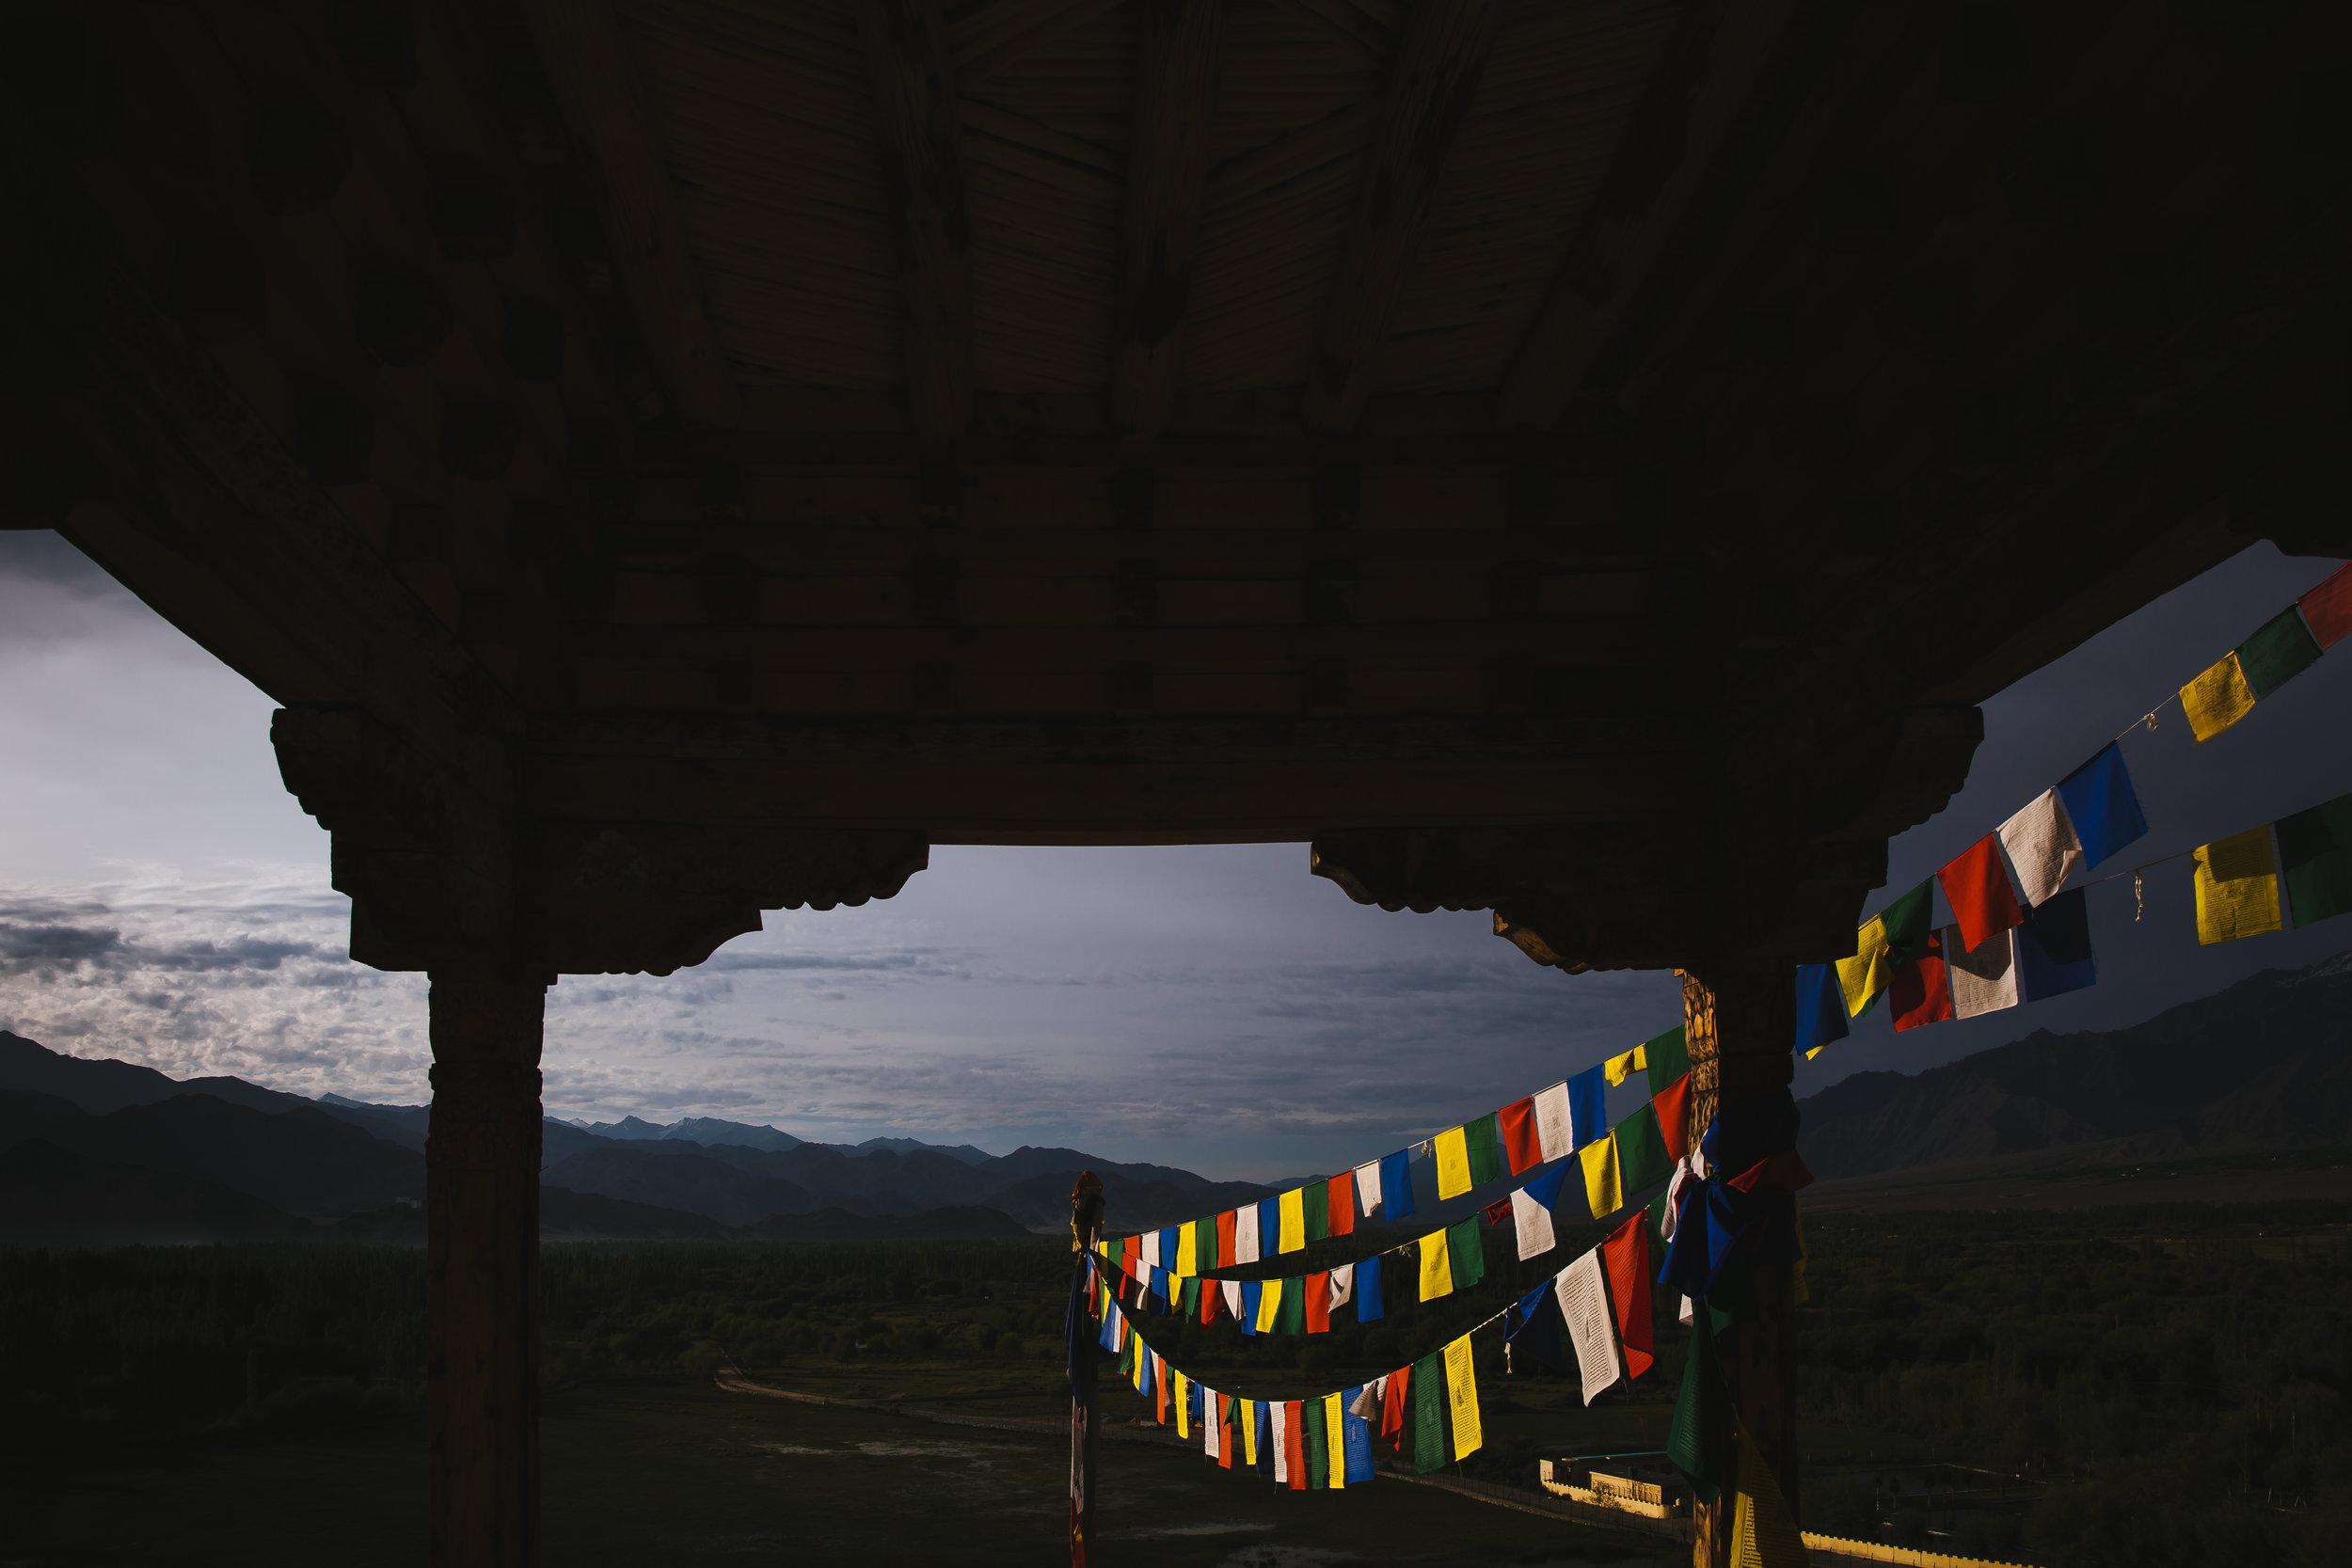 morning prayer flags